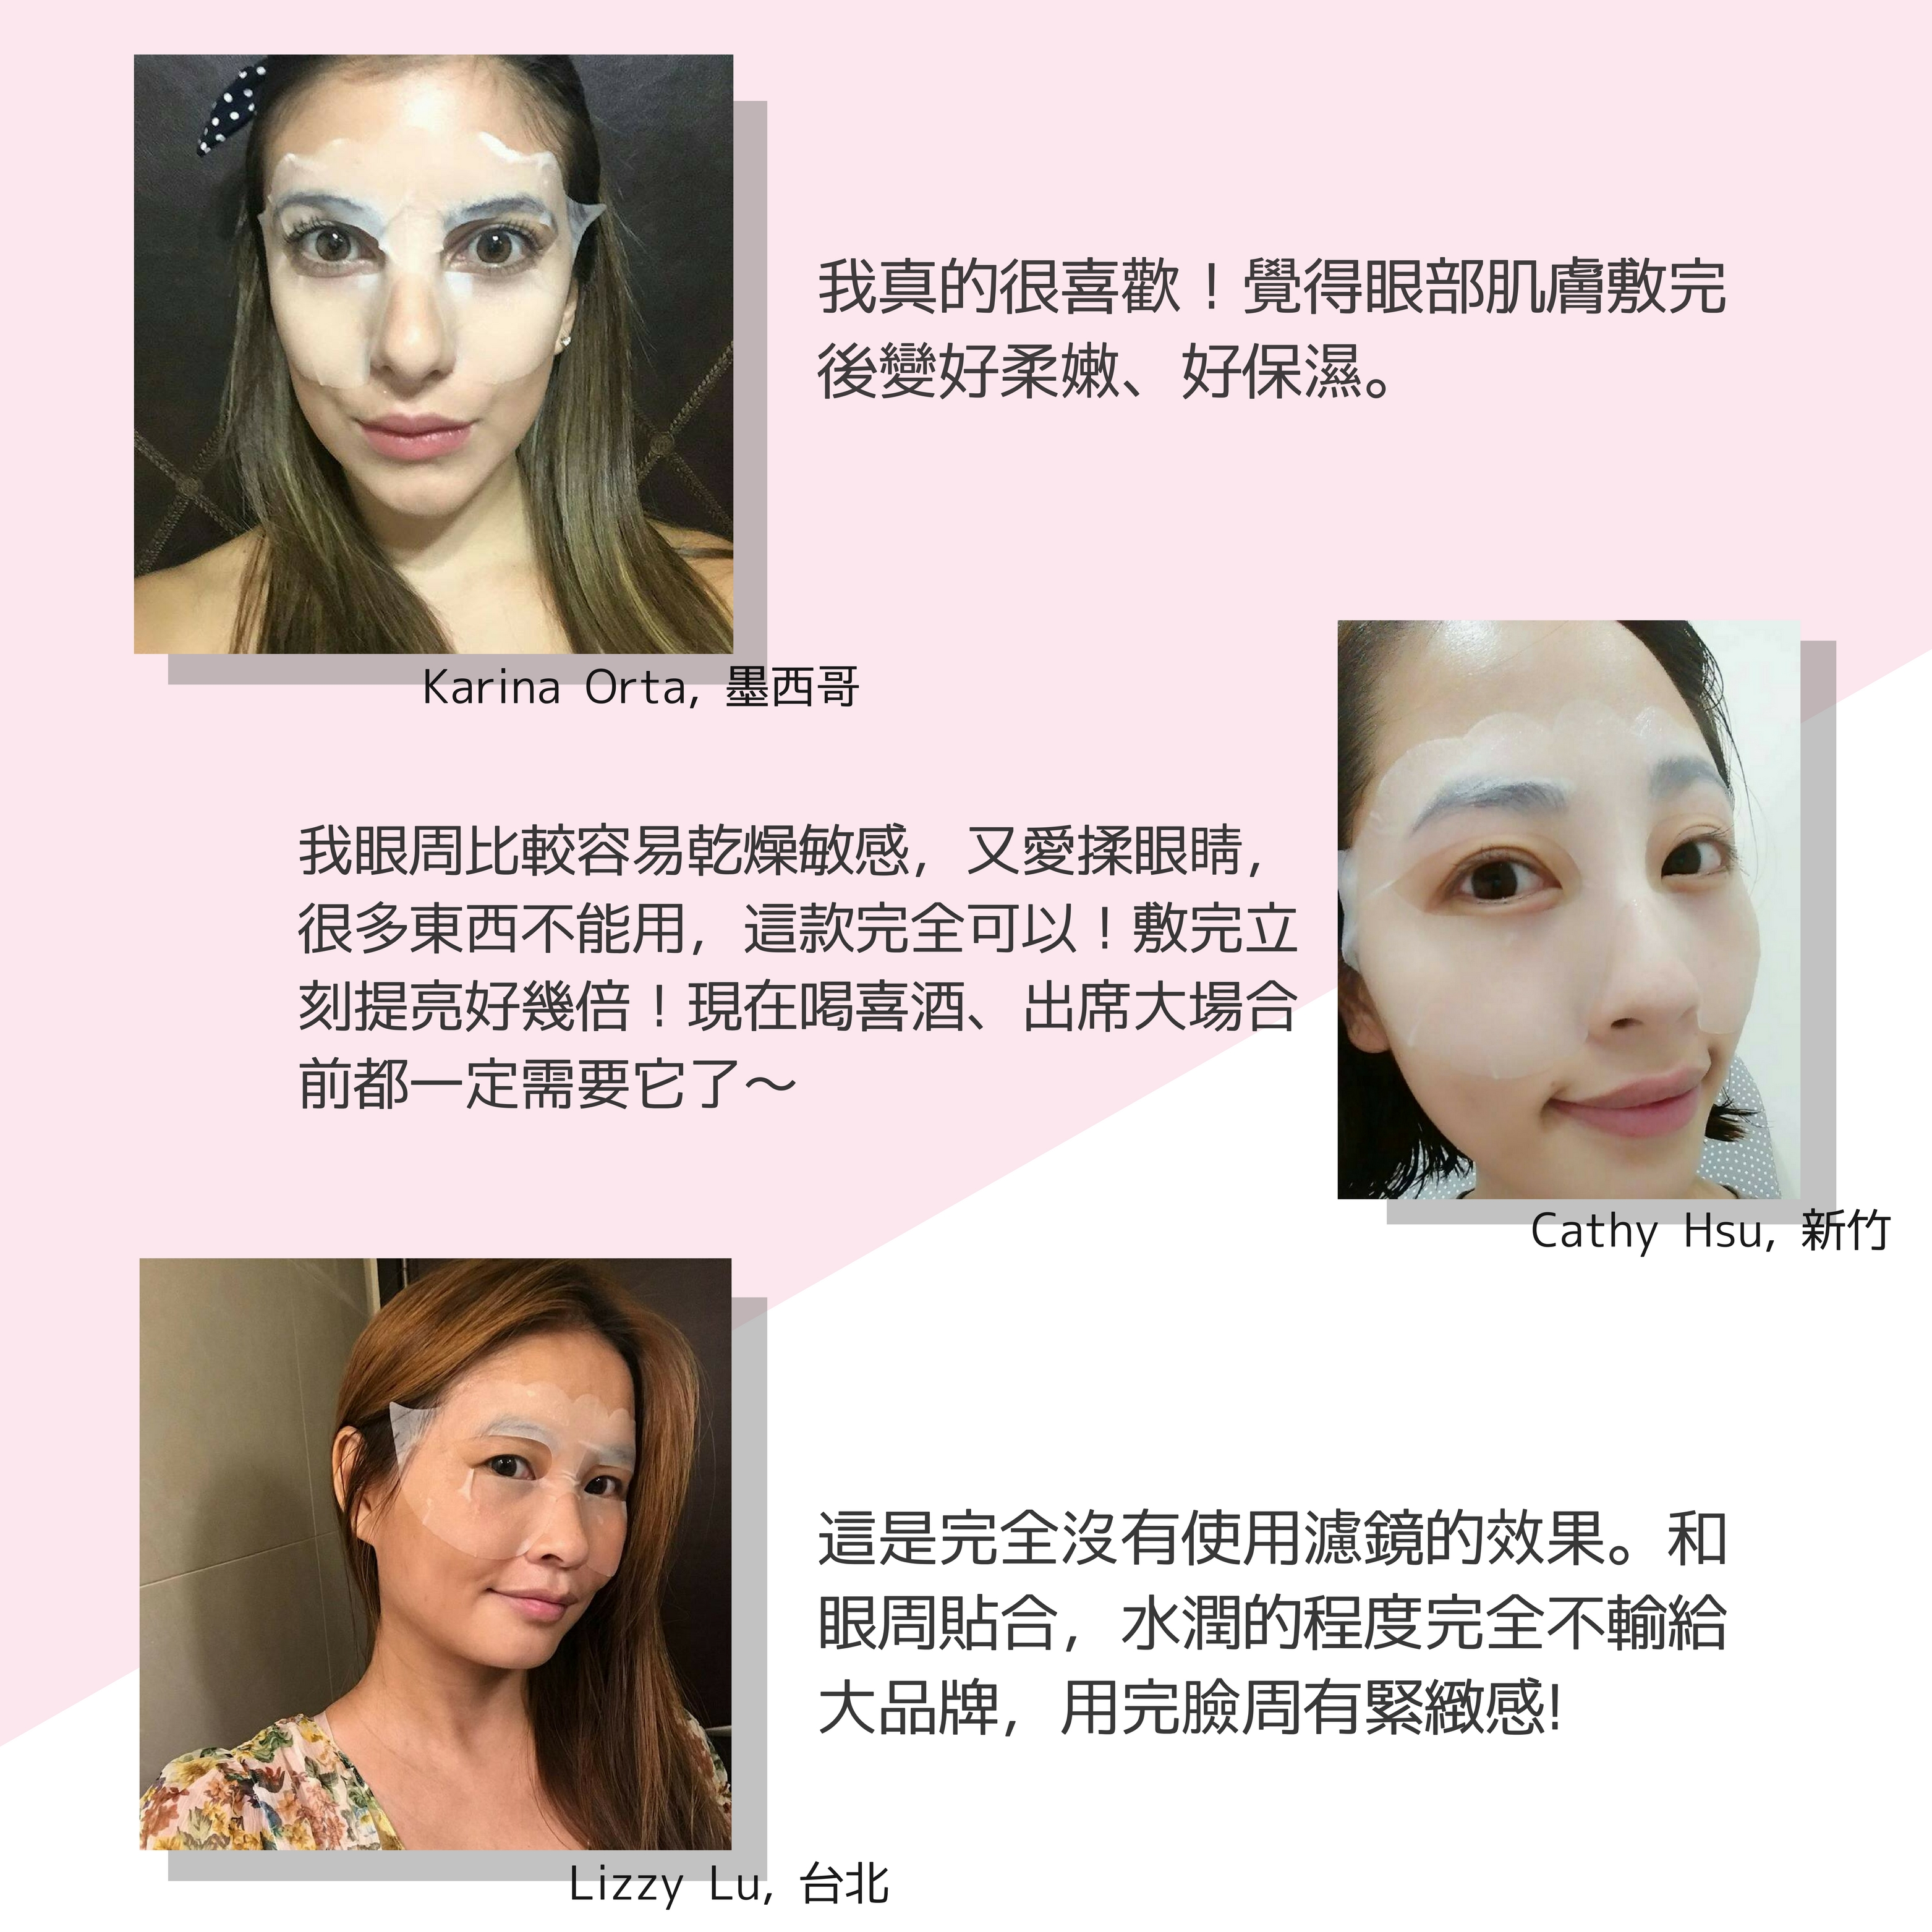 Aeria Skin, 超能植感緊緻亮眼膜, 眼膜推薦, 眼霜推薦, 眼下保養, 眼皮緊緻, 眼皮拉提, 眼周保養, 美白眼膜, 亮白眼膜, 試用, 體驗